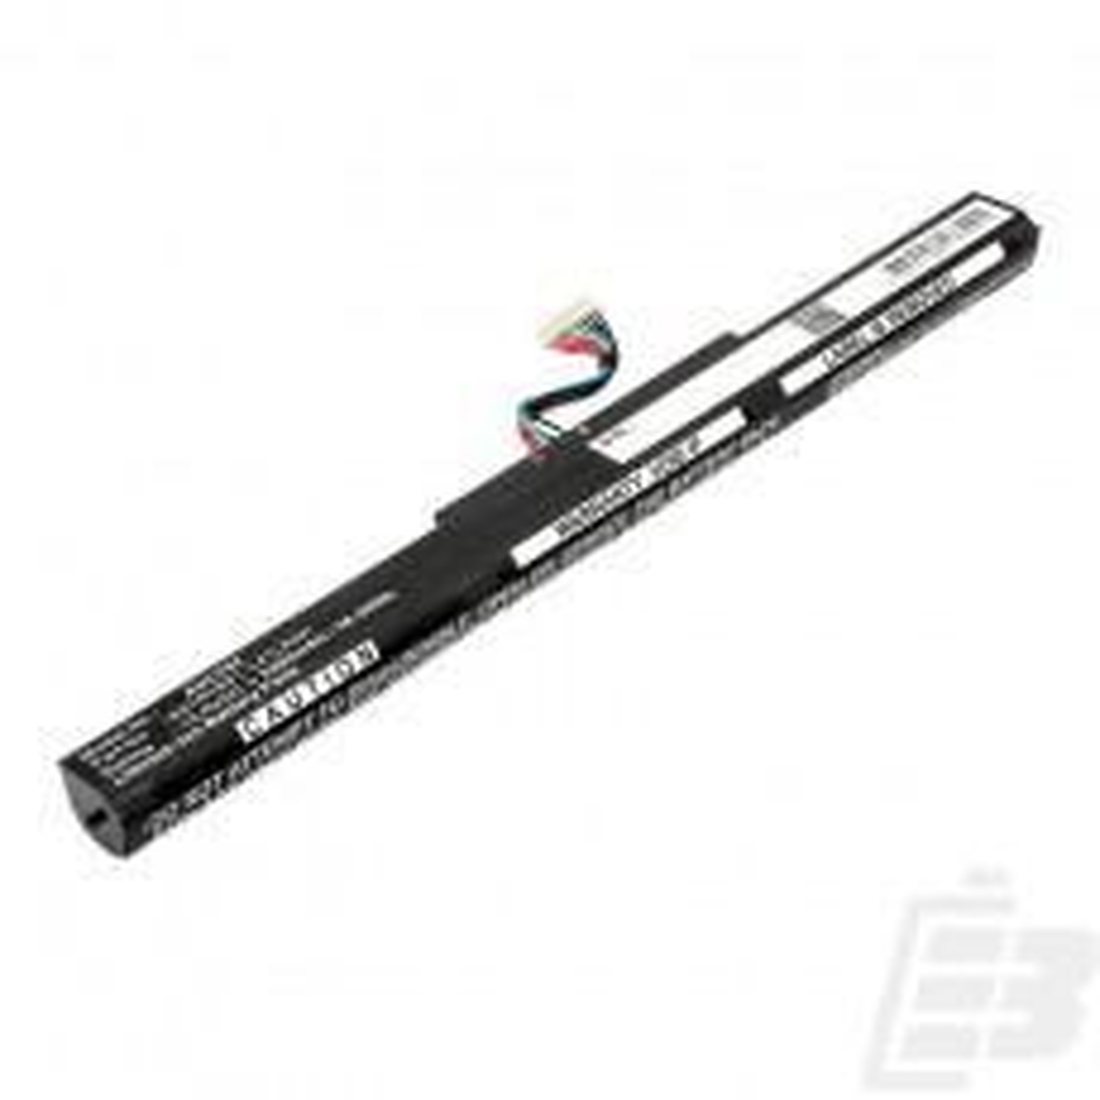 Laptop battery Asus N552_1